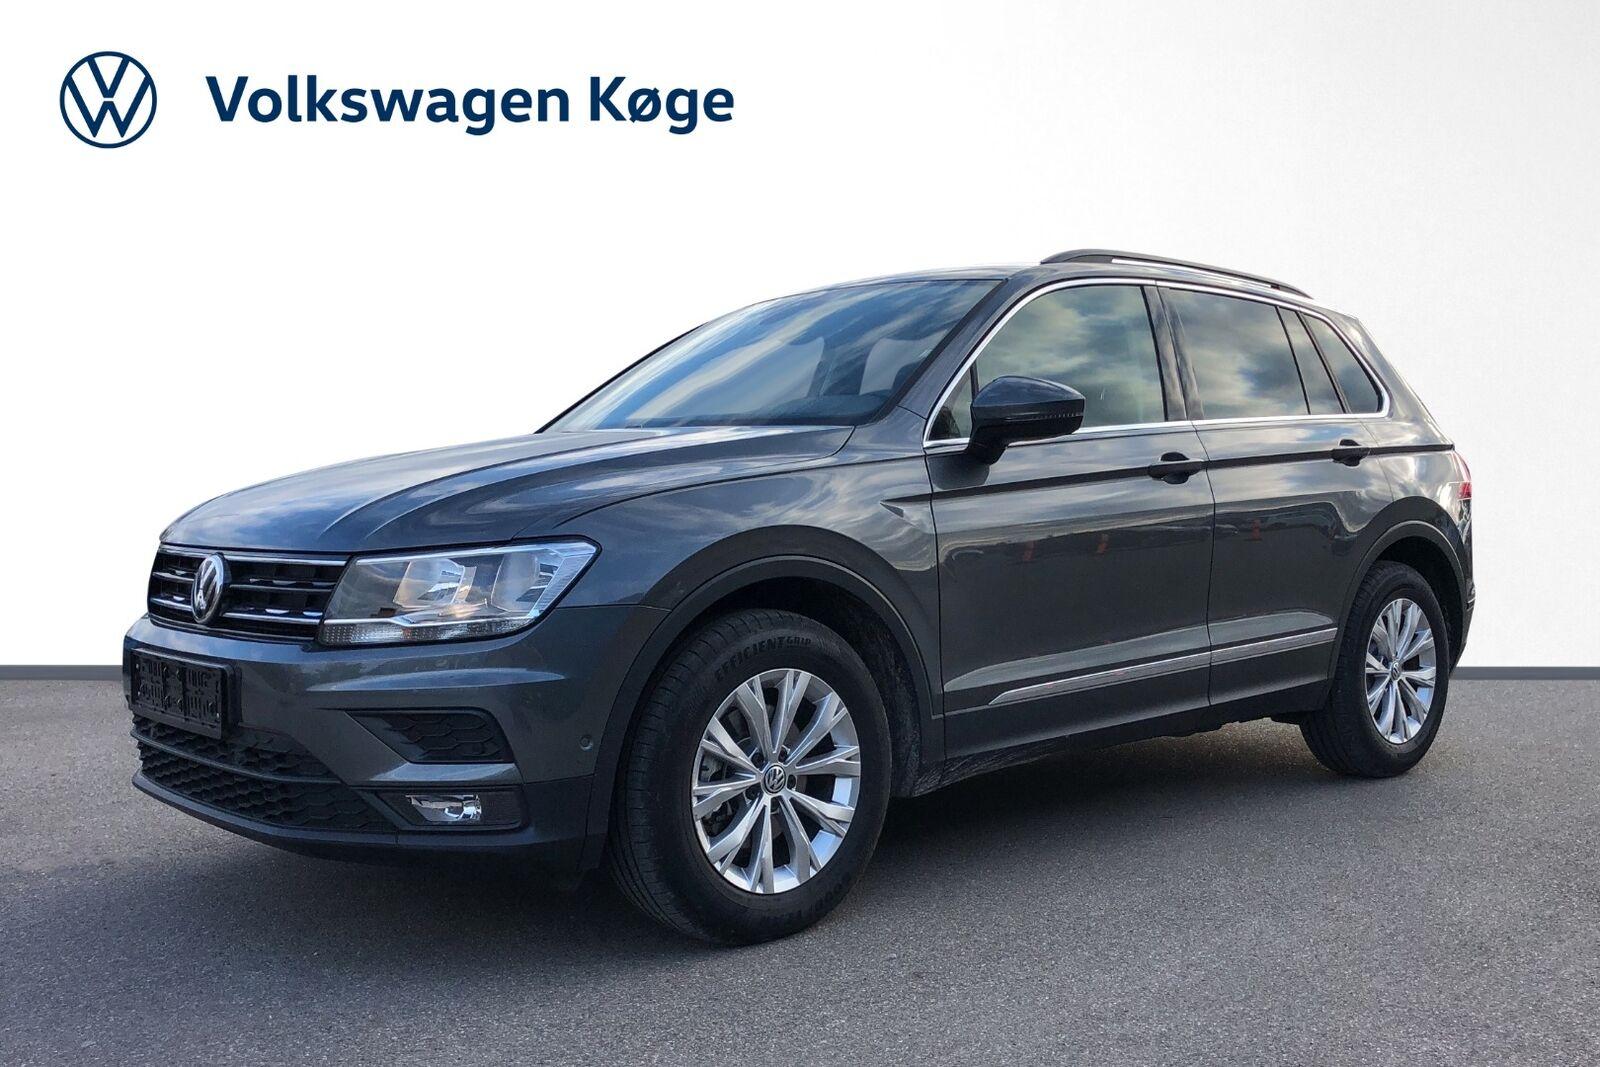 VW Tiguan 1,5 TSi 150 Comfortline DSG 5d - 374.900 kr.